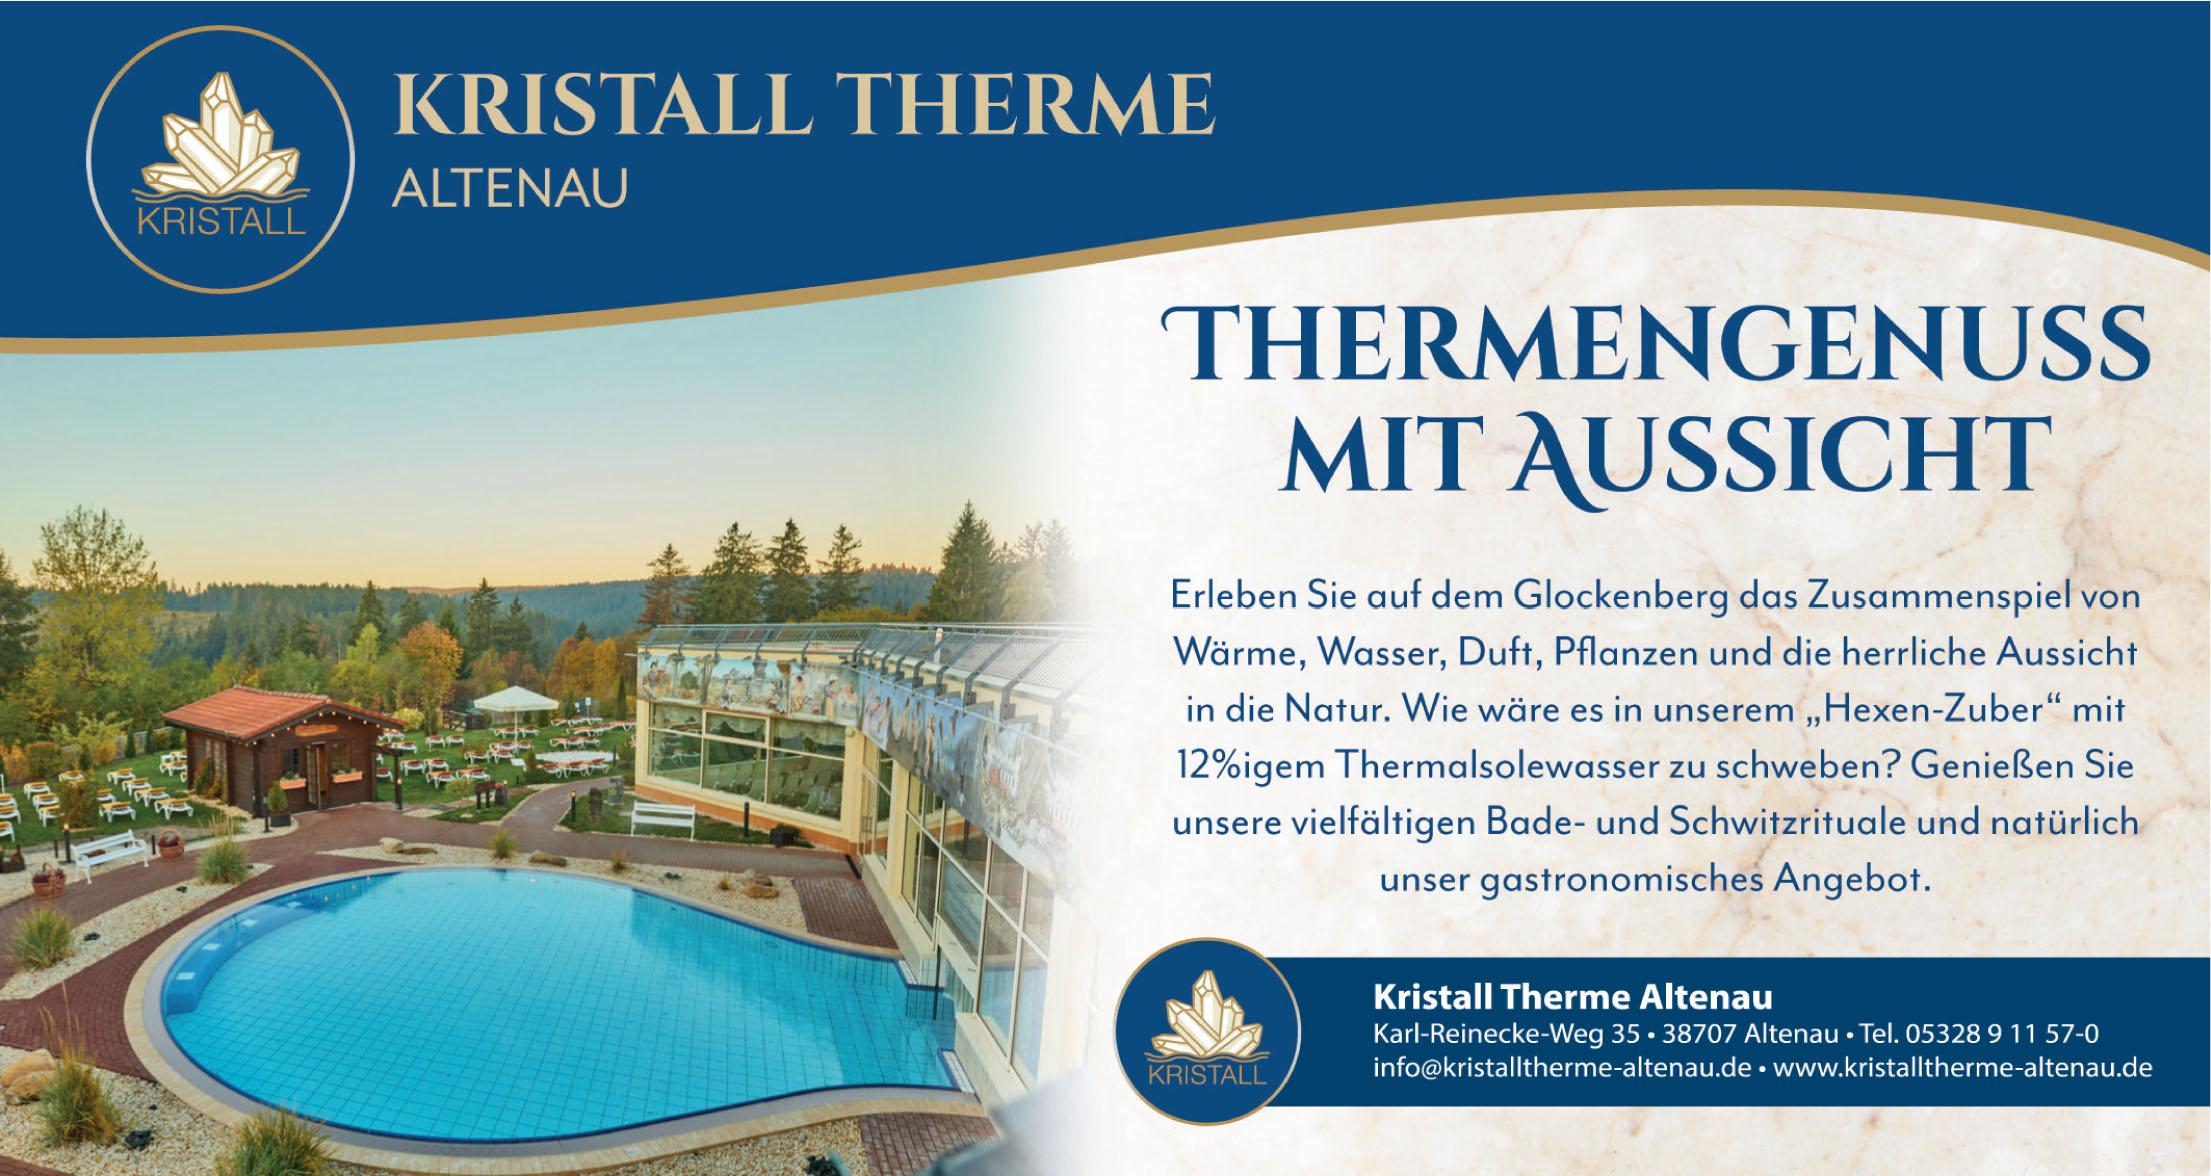 Kristall Therme Altenau